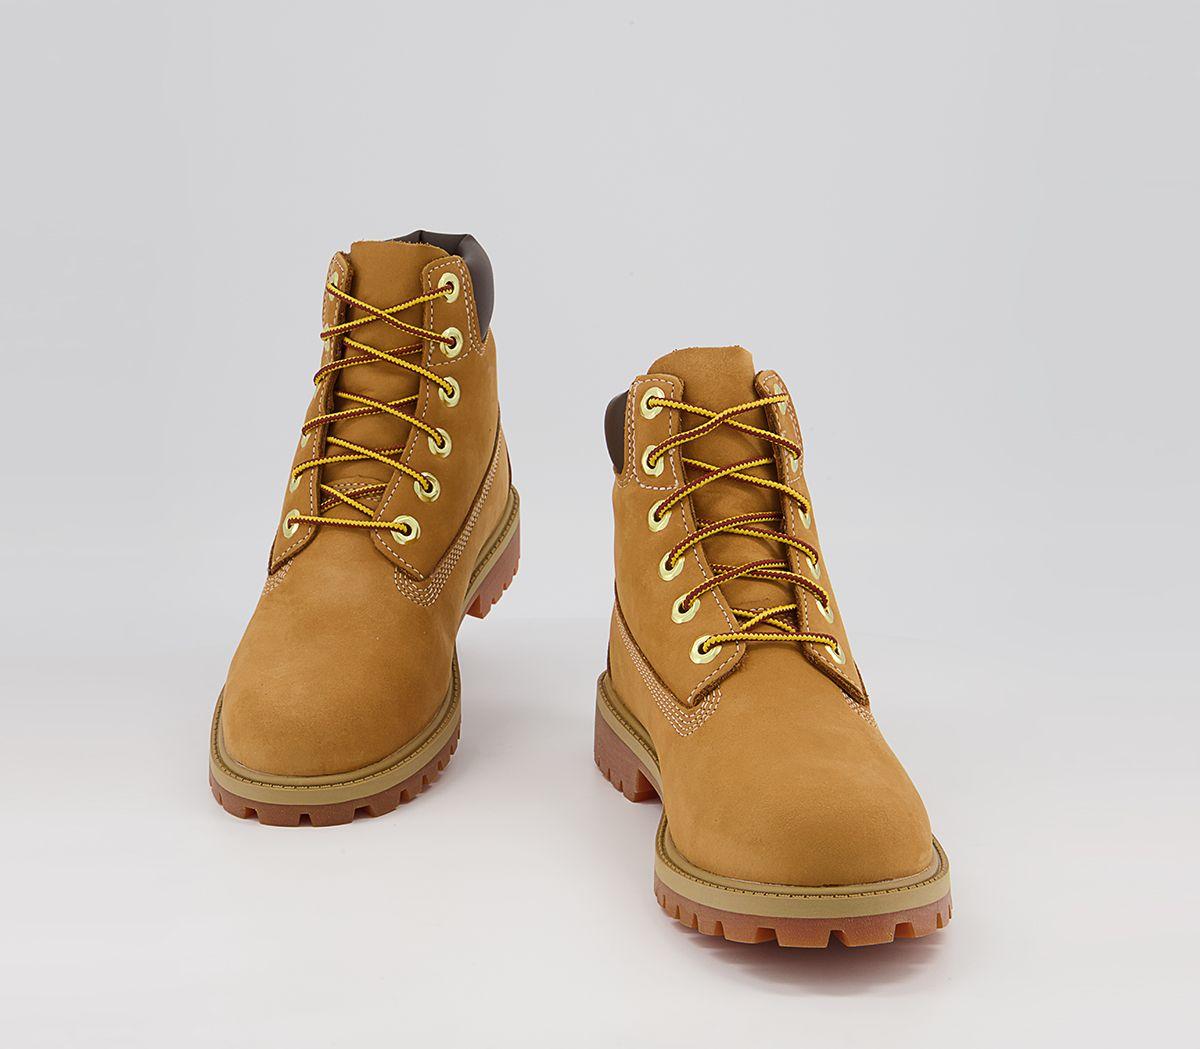 f802689d0dac5f Timberland Juniors 6 Inch Premium Waterproof Boots Wheat Nubuck ...